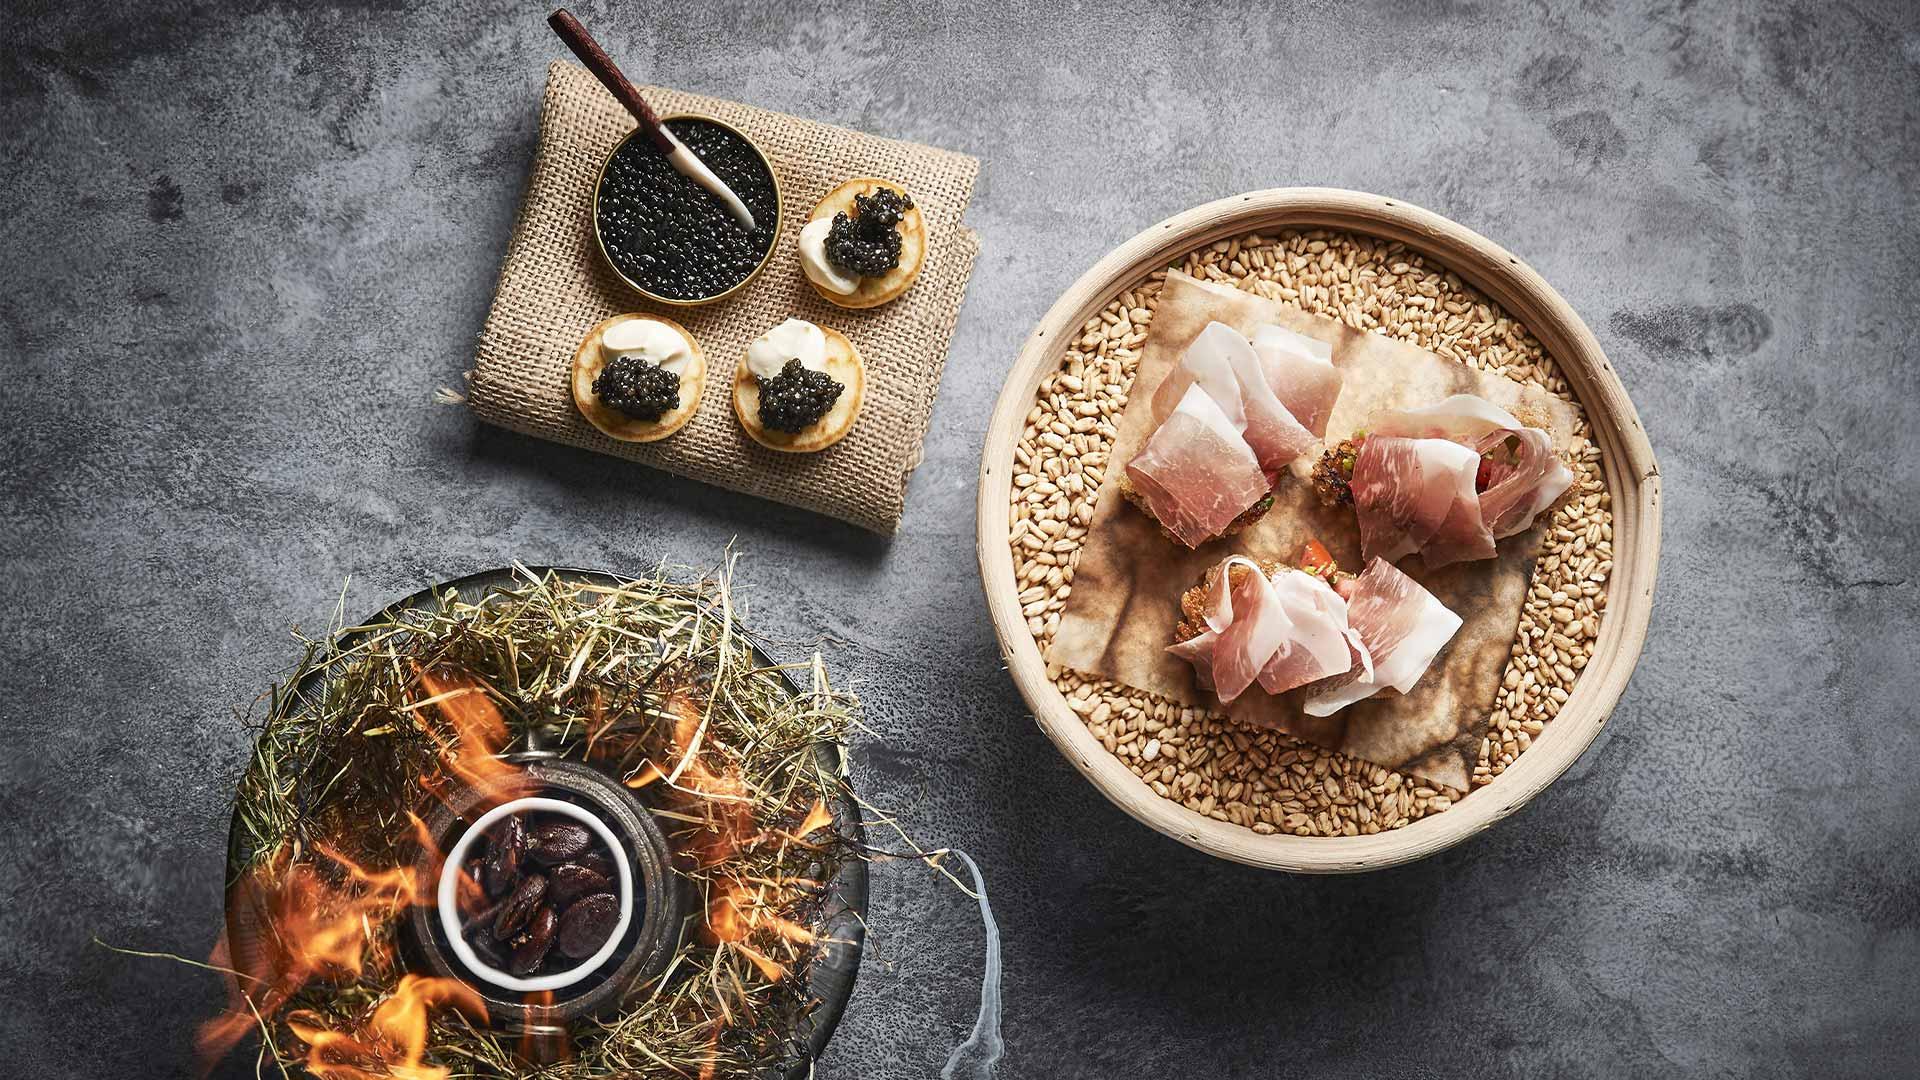 ramsløg dansk natur restaurant fauna